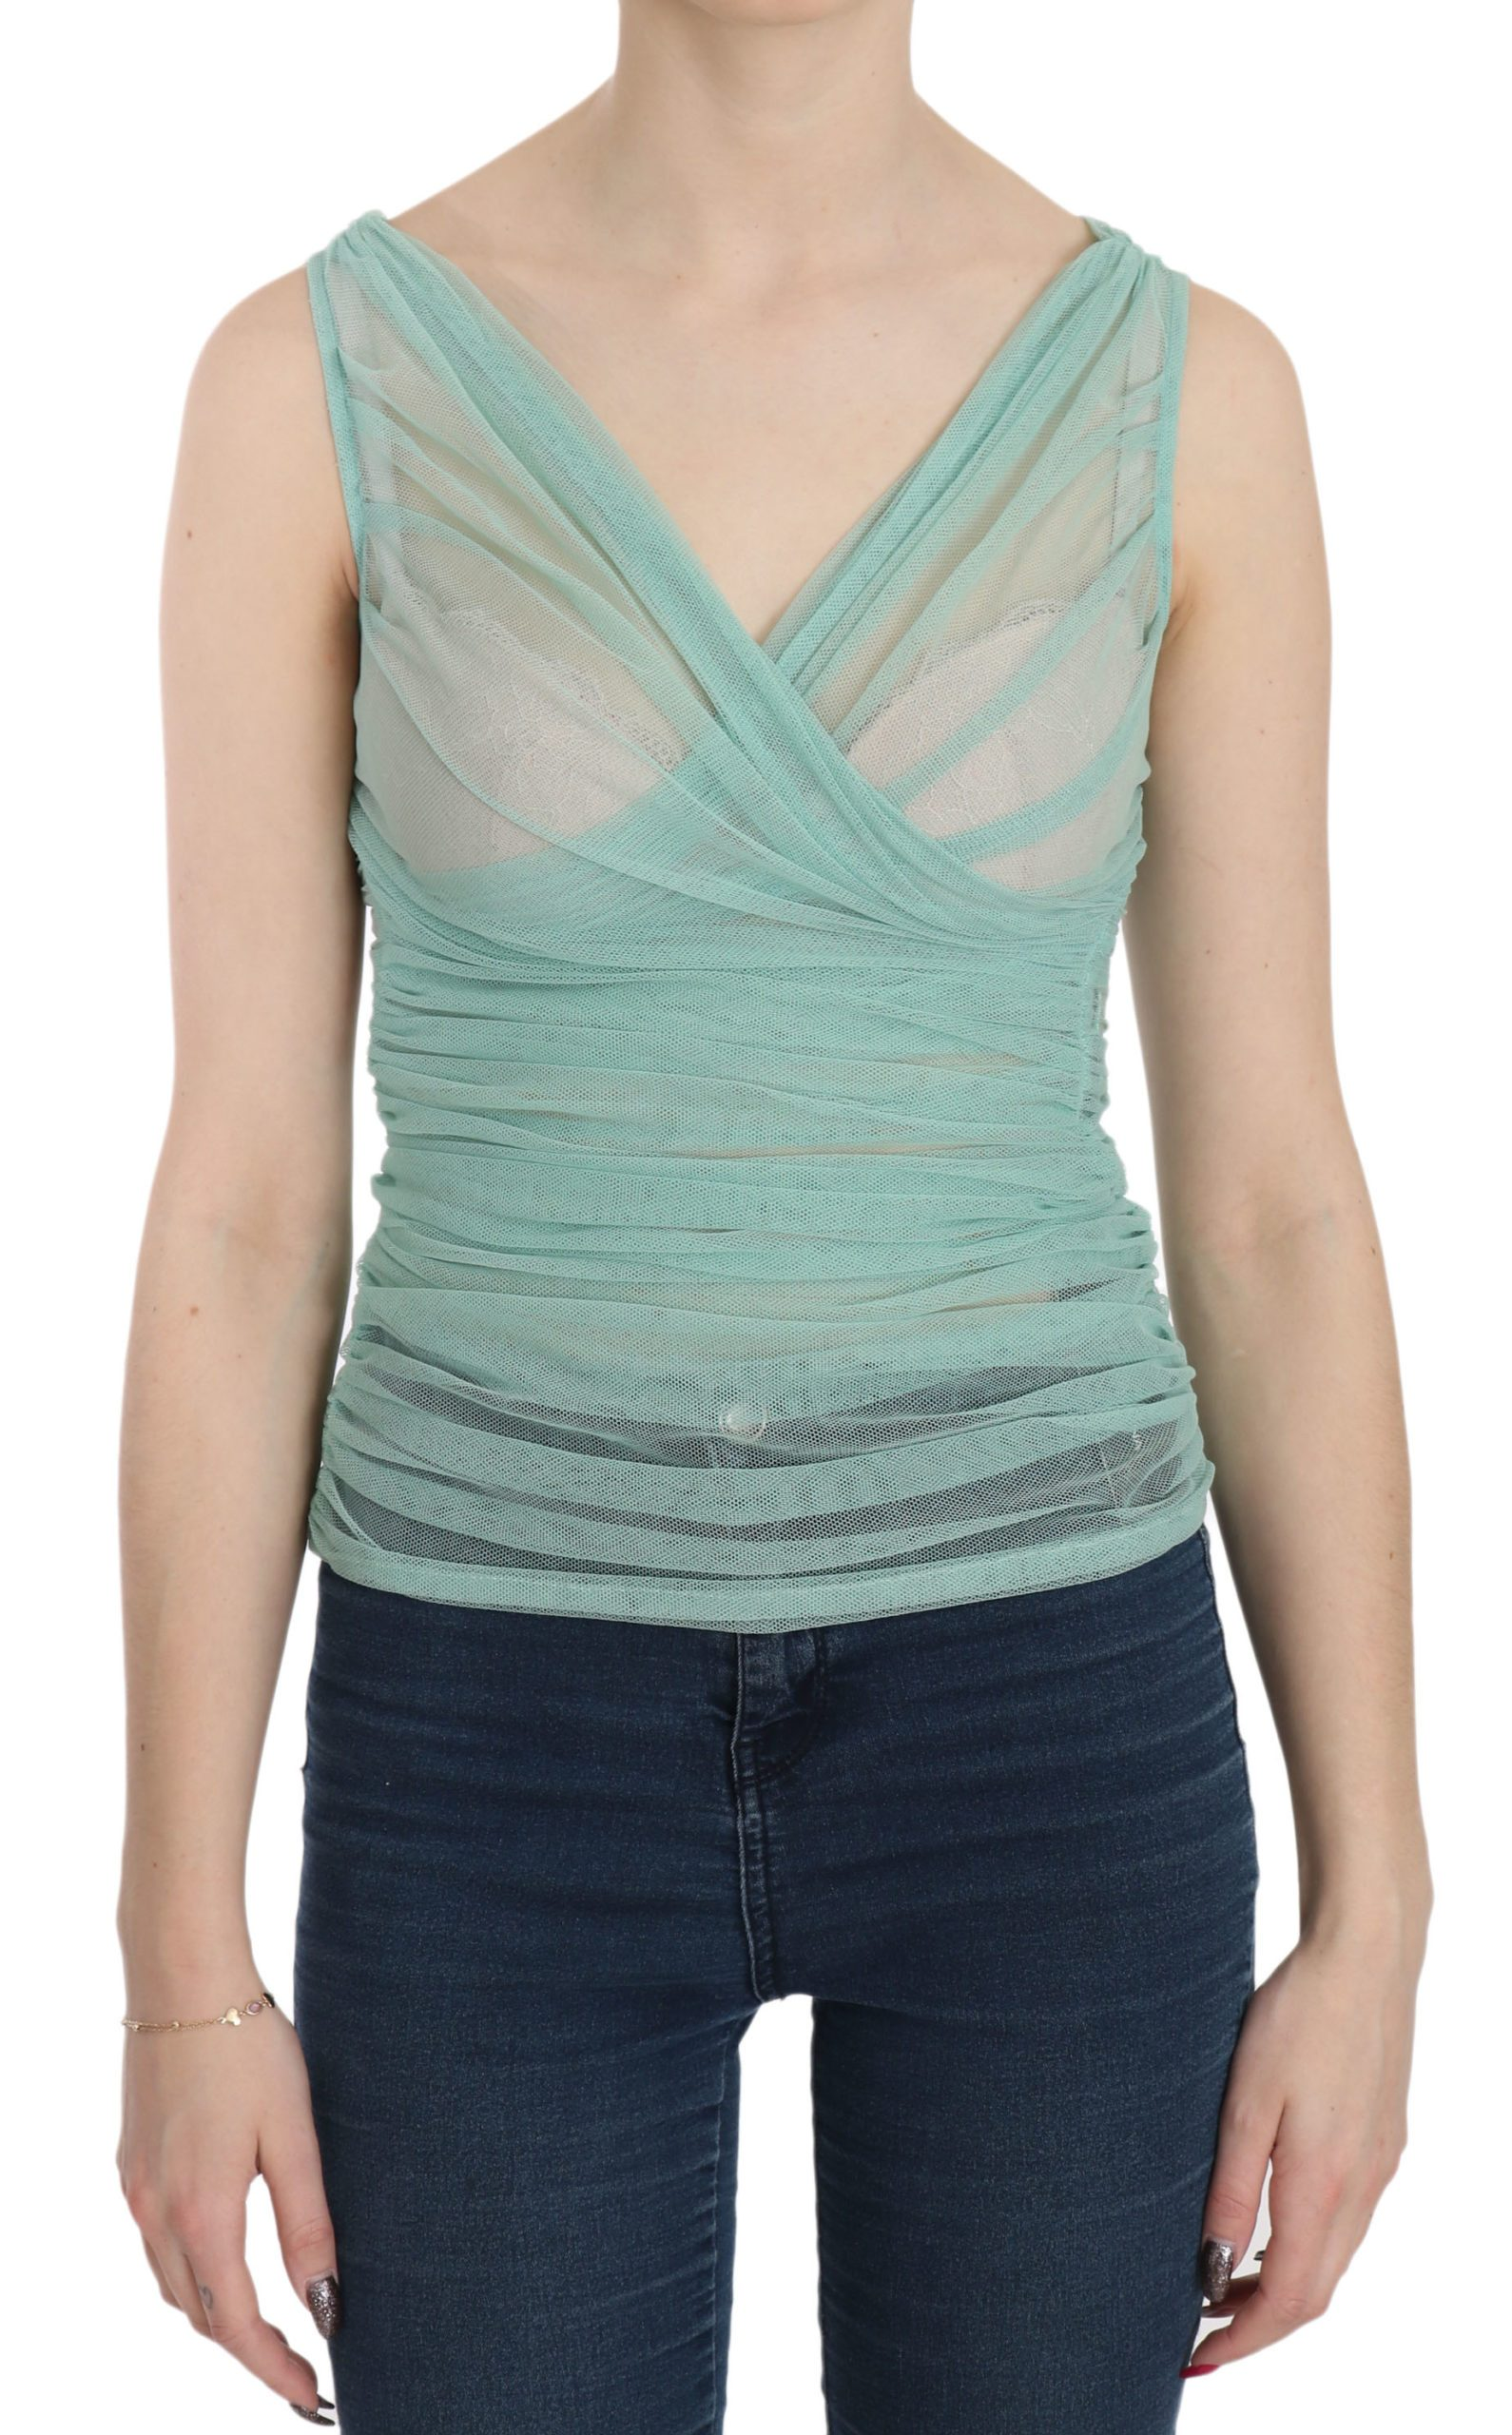 Dolce & Gabbana Women's Stretch Mesh Top Green TSH3399 - IT46 | L